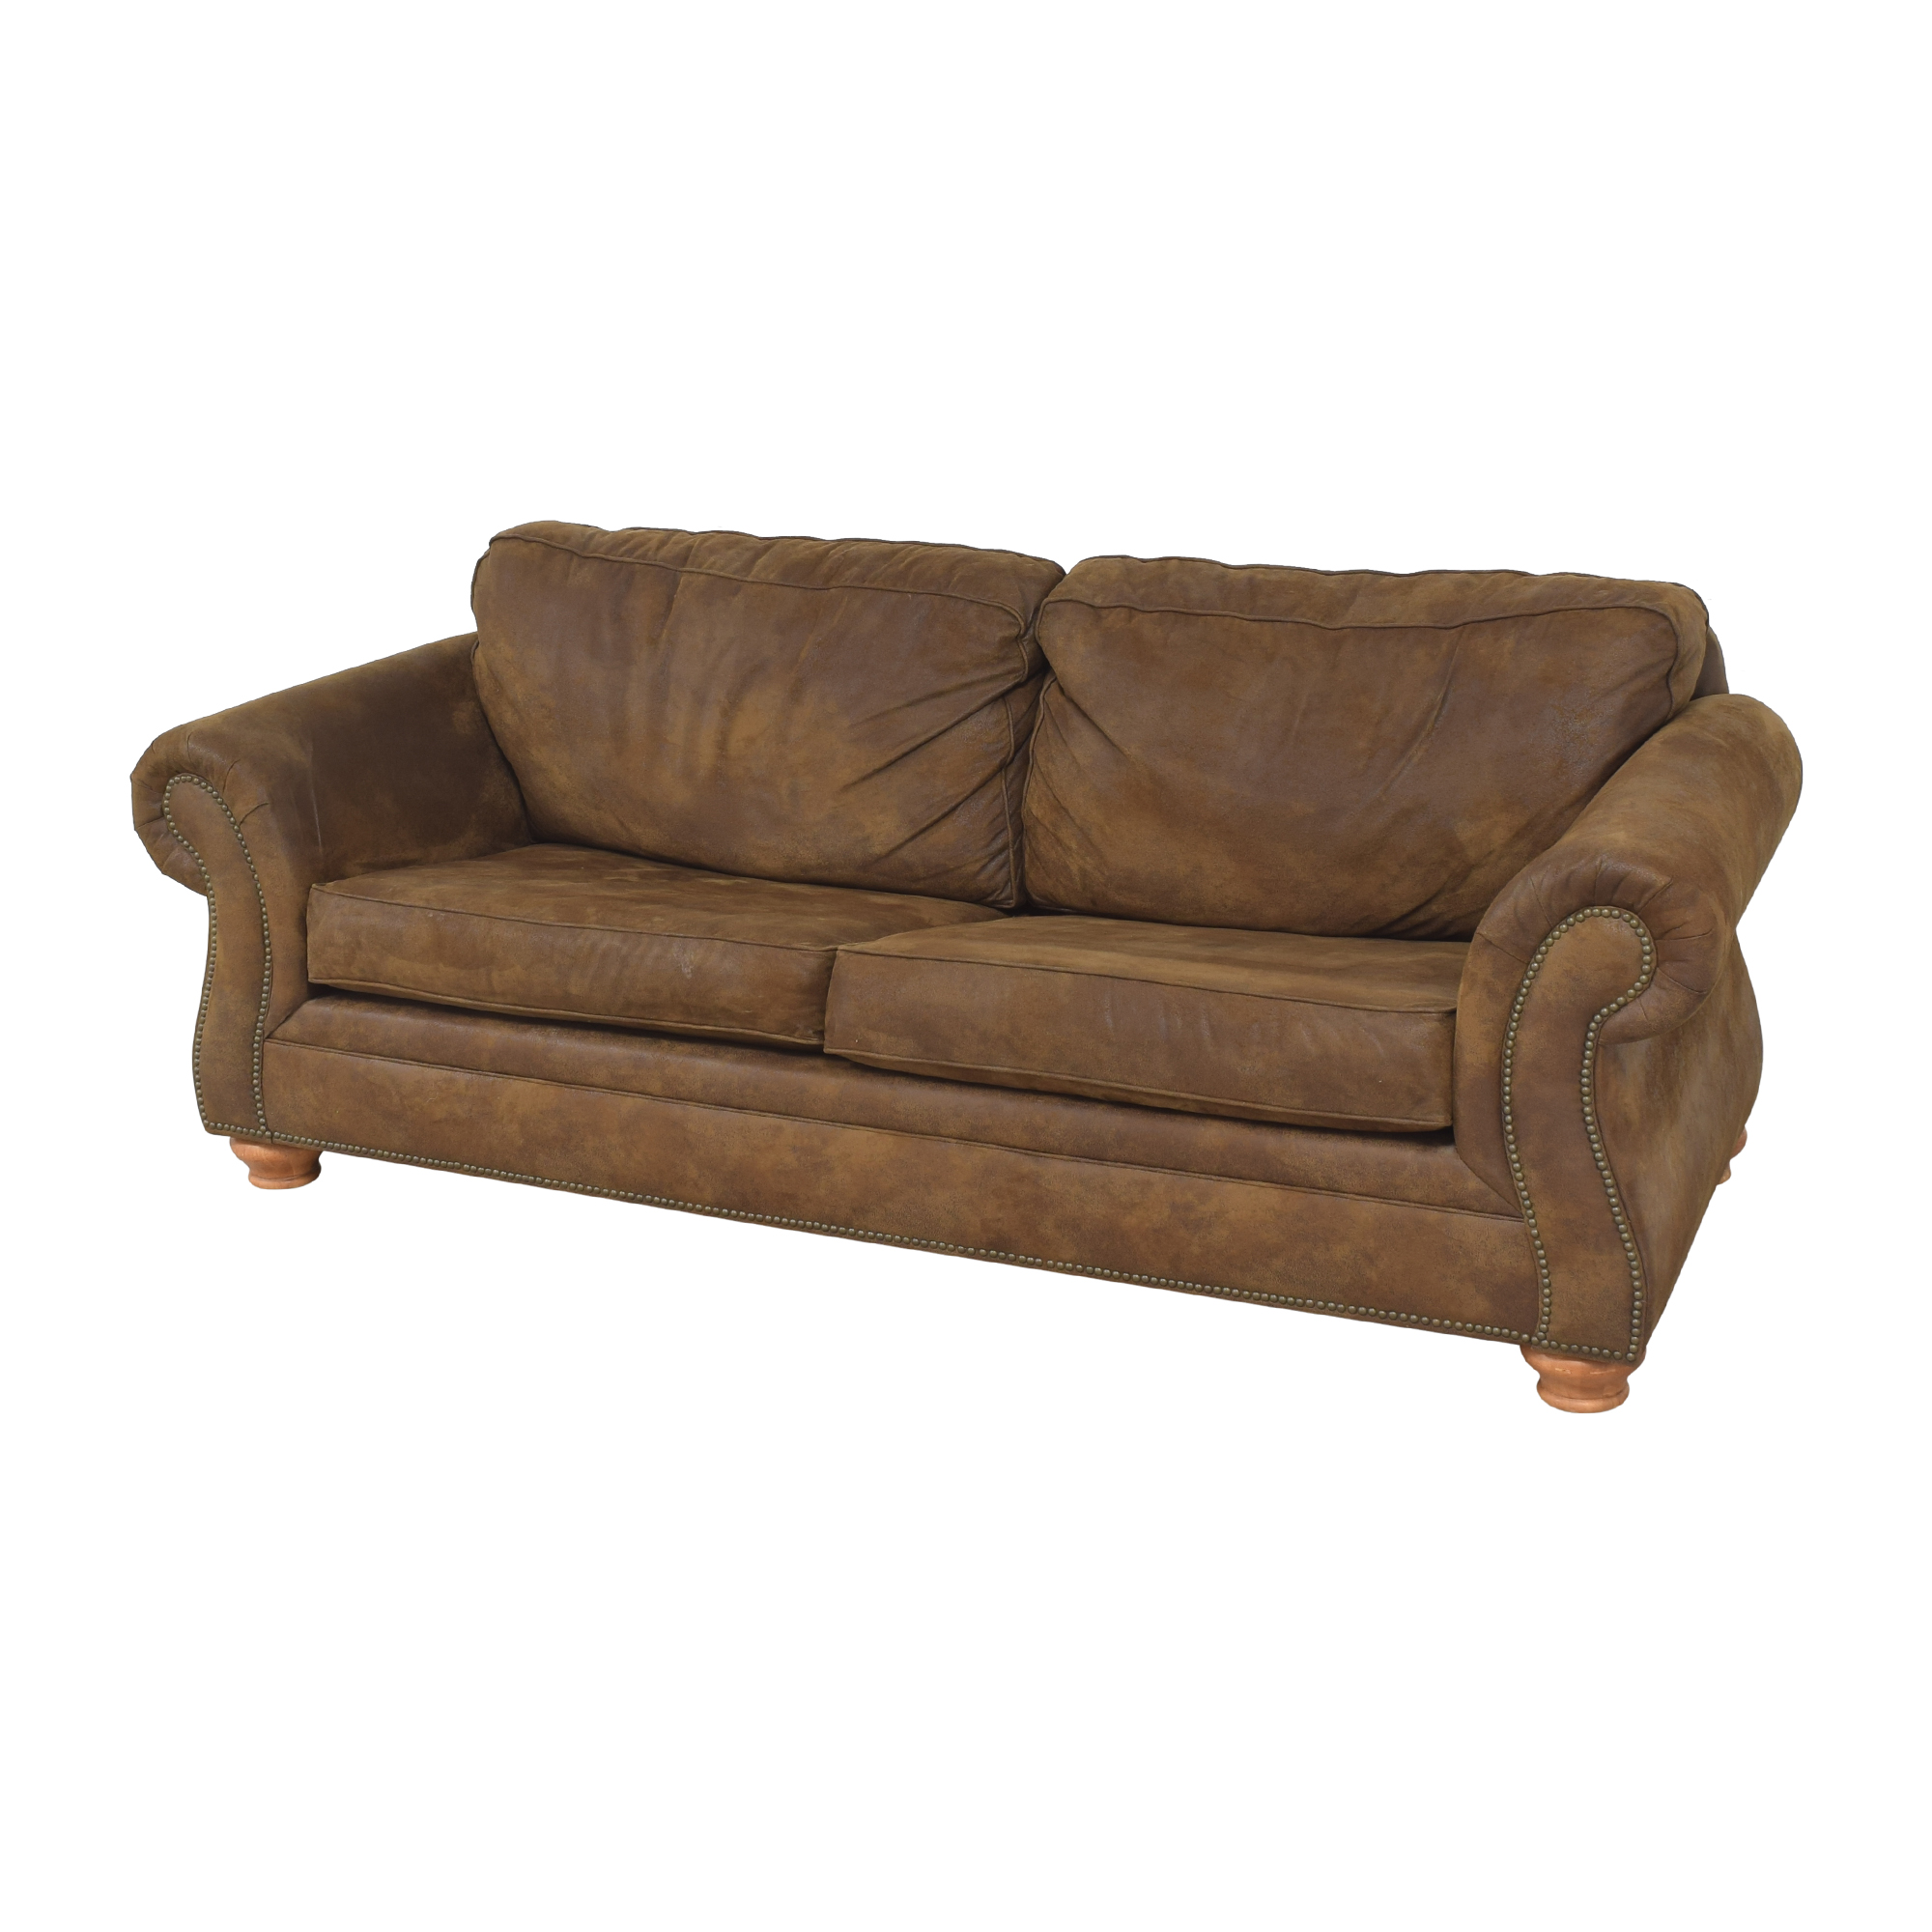 shop Raymour & Flanigan Canyon Ridge Sleeper Sofa Raymour & Flanigan